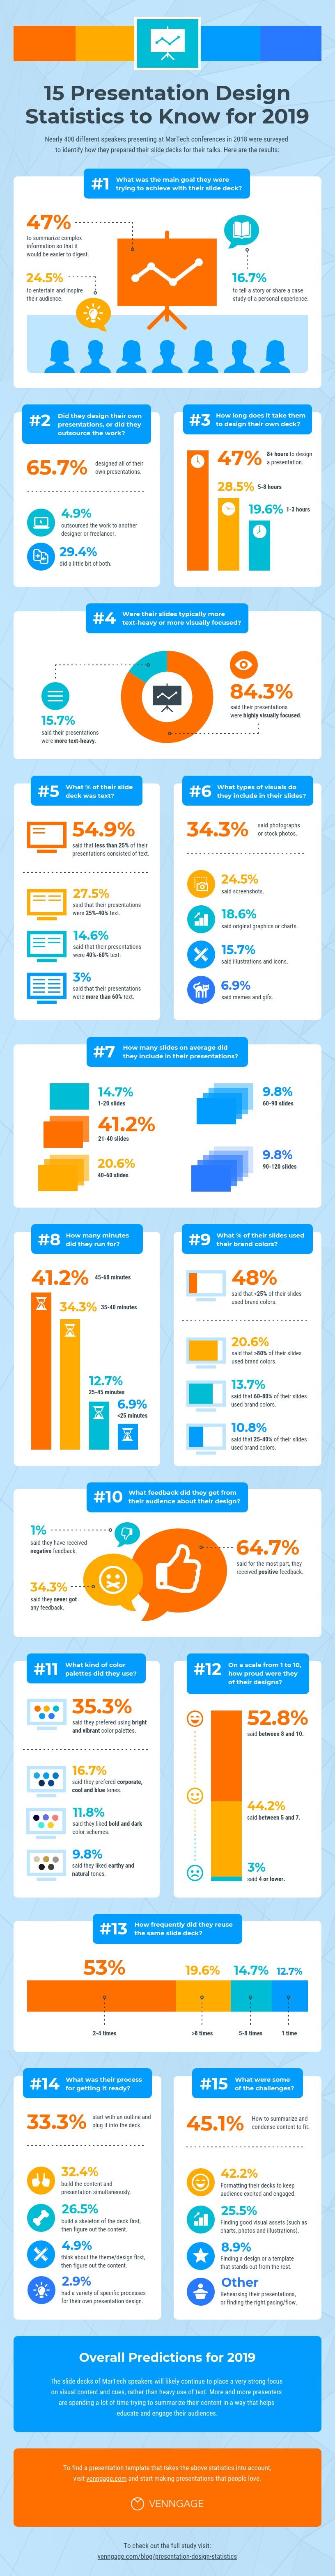 presentation design infographic statistics